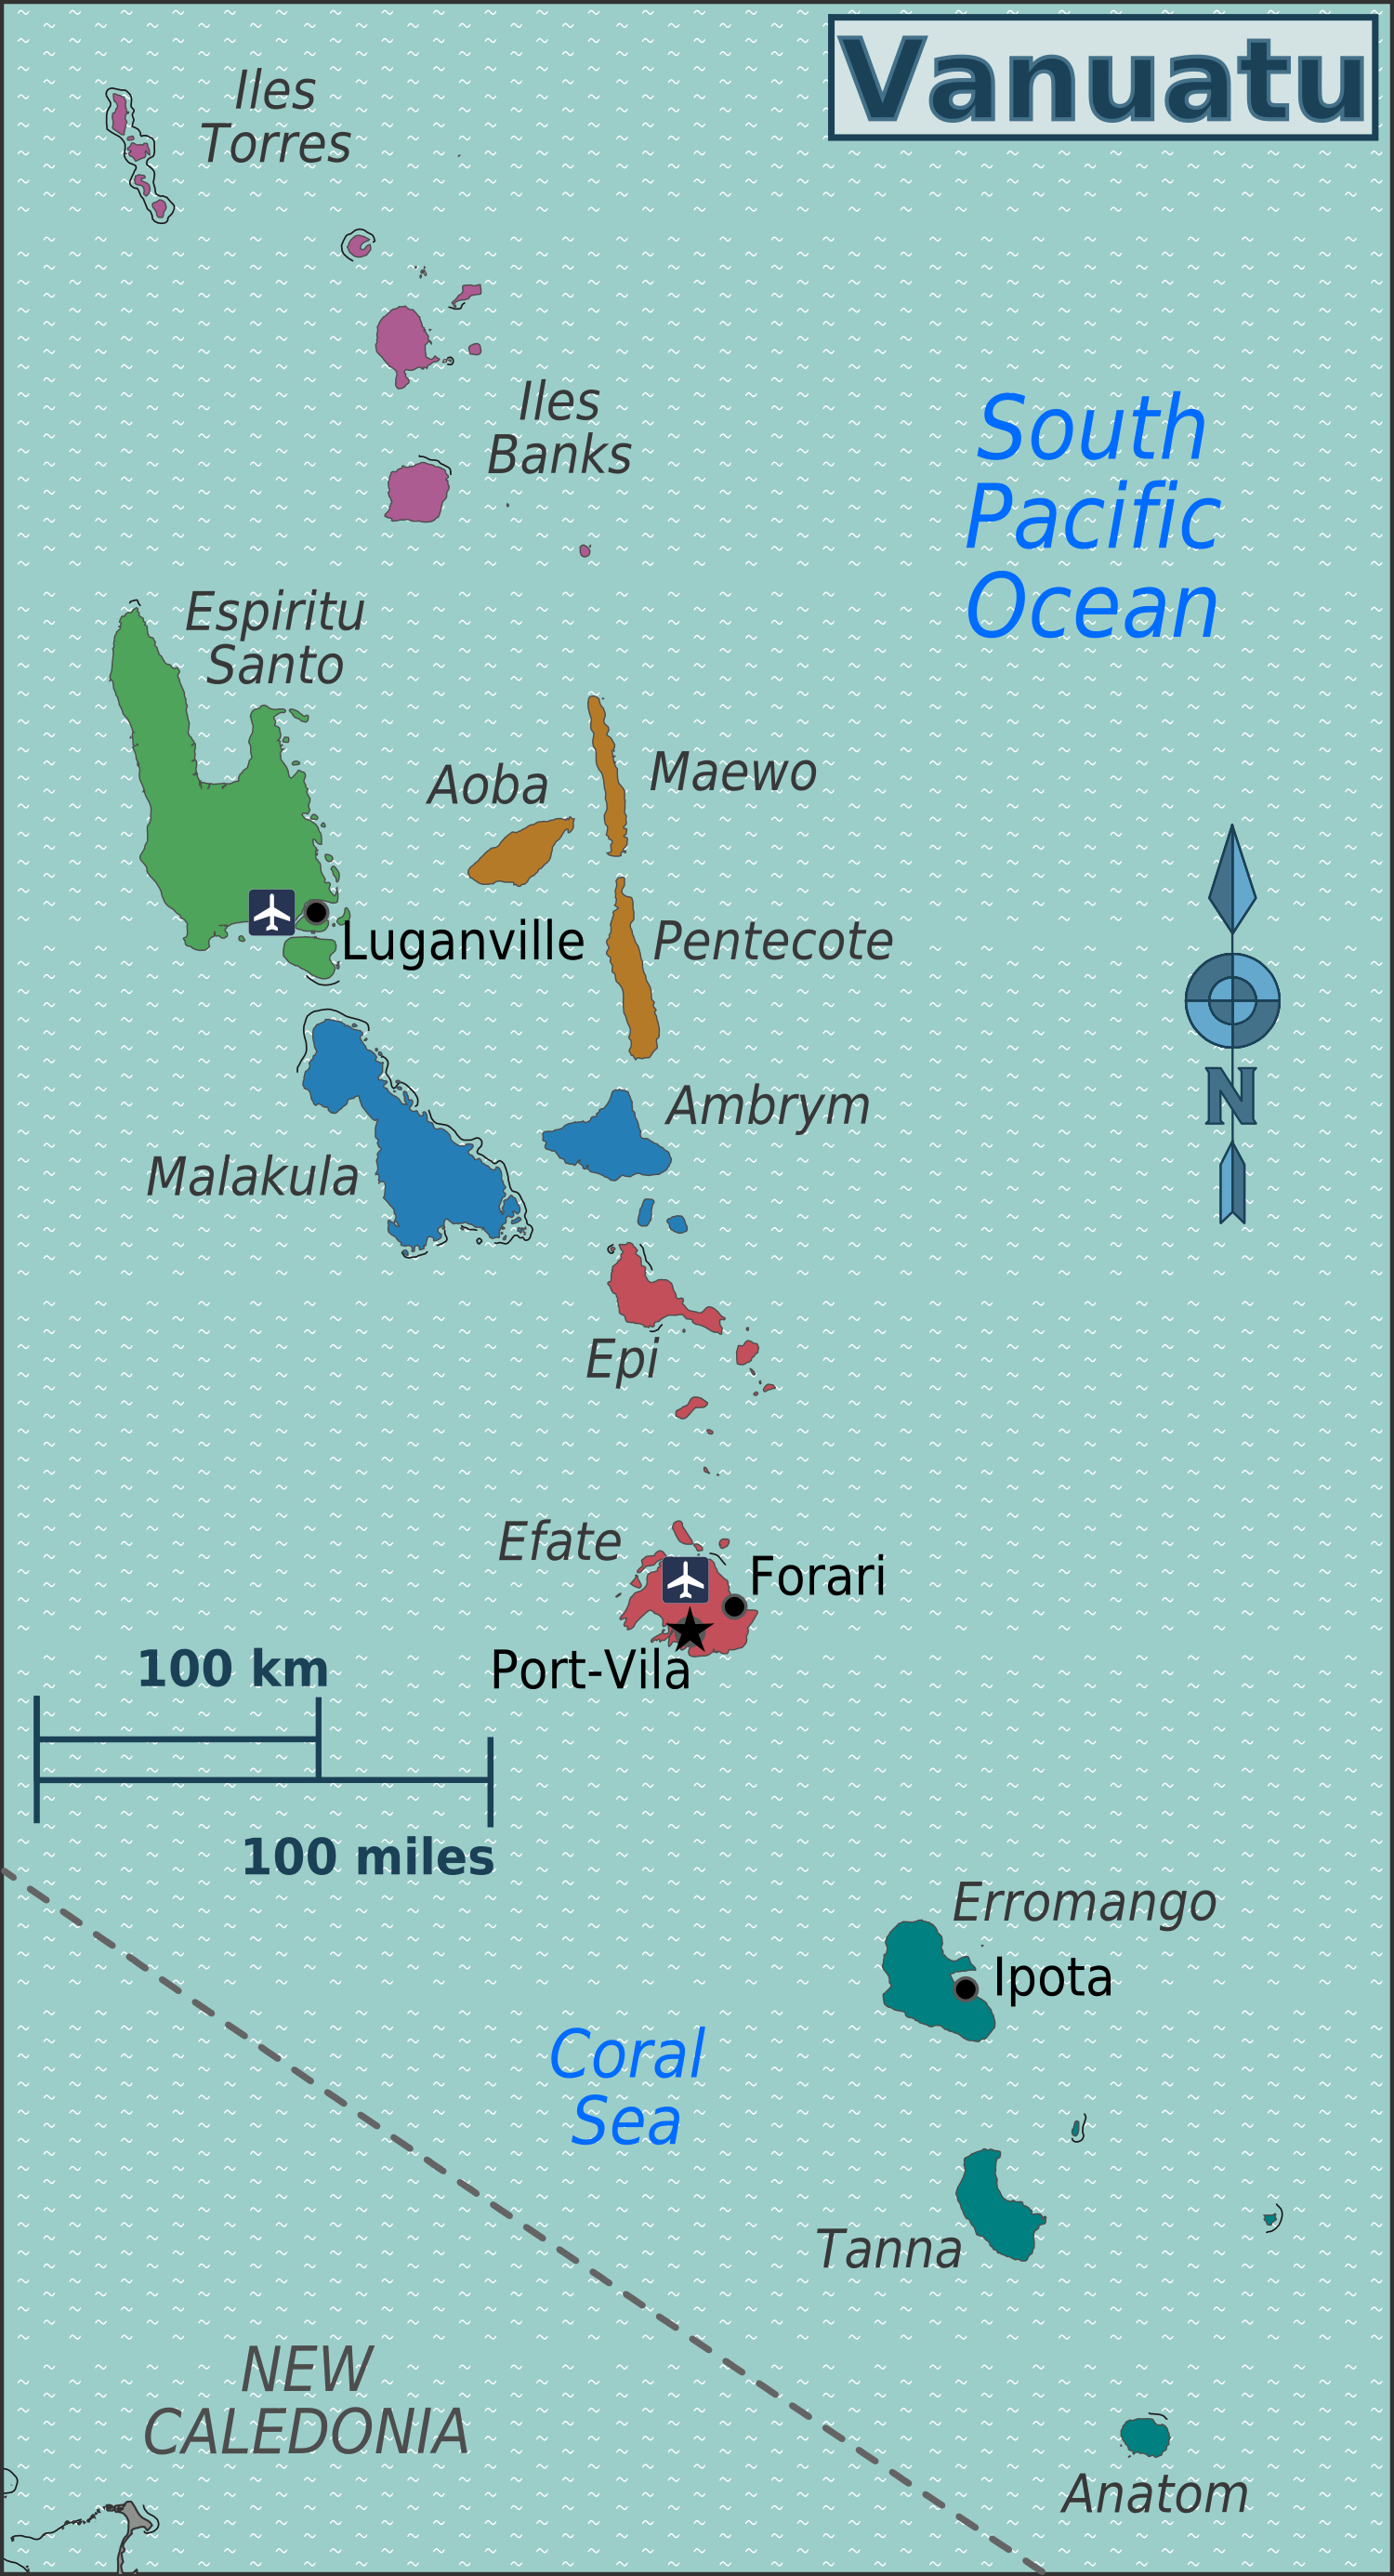 FileVanuatu Regions mappng Wikimedia Commons